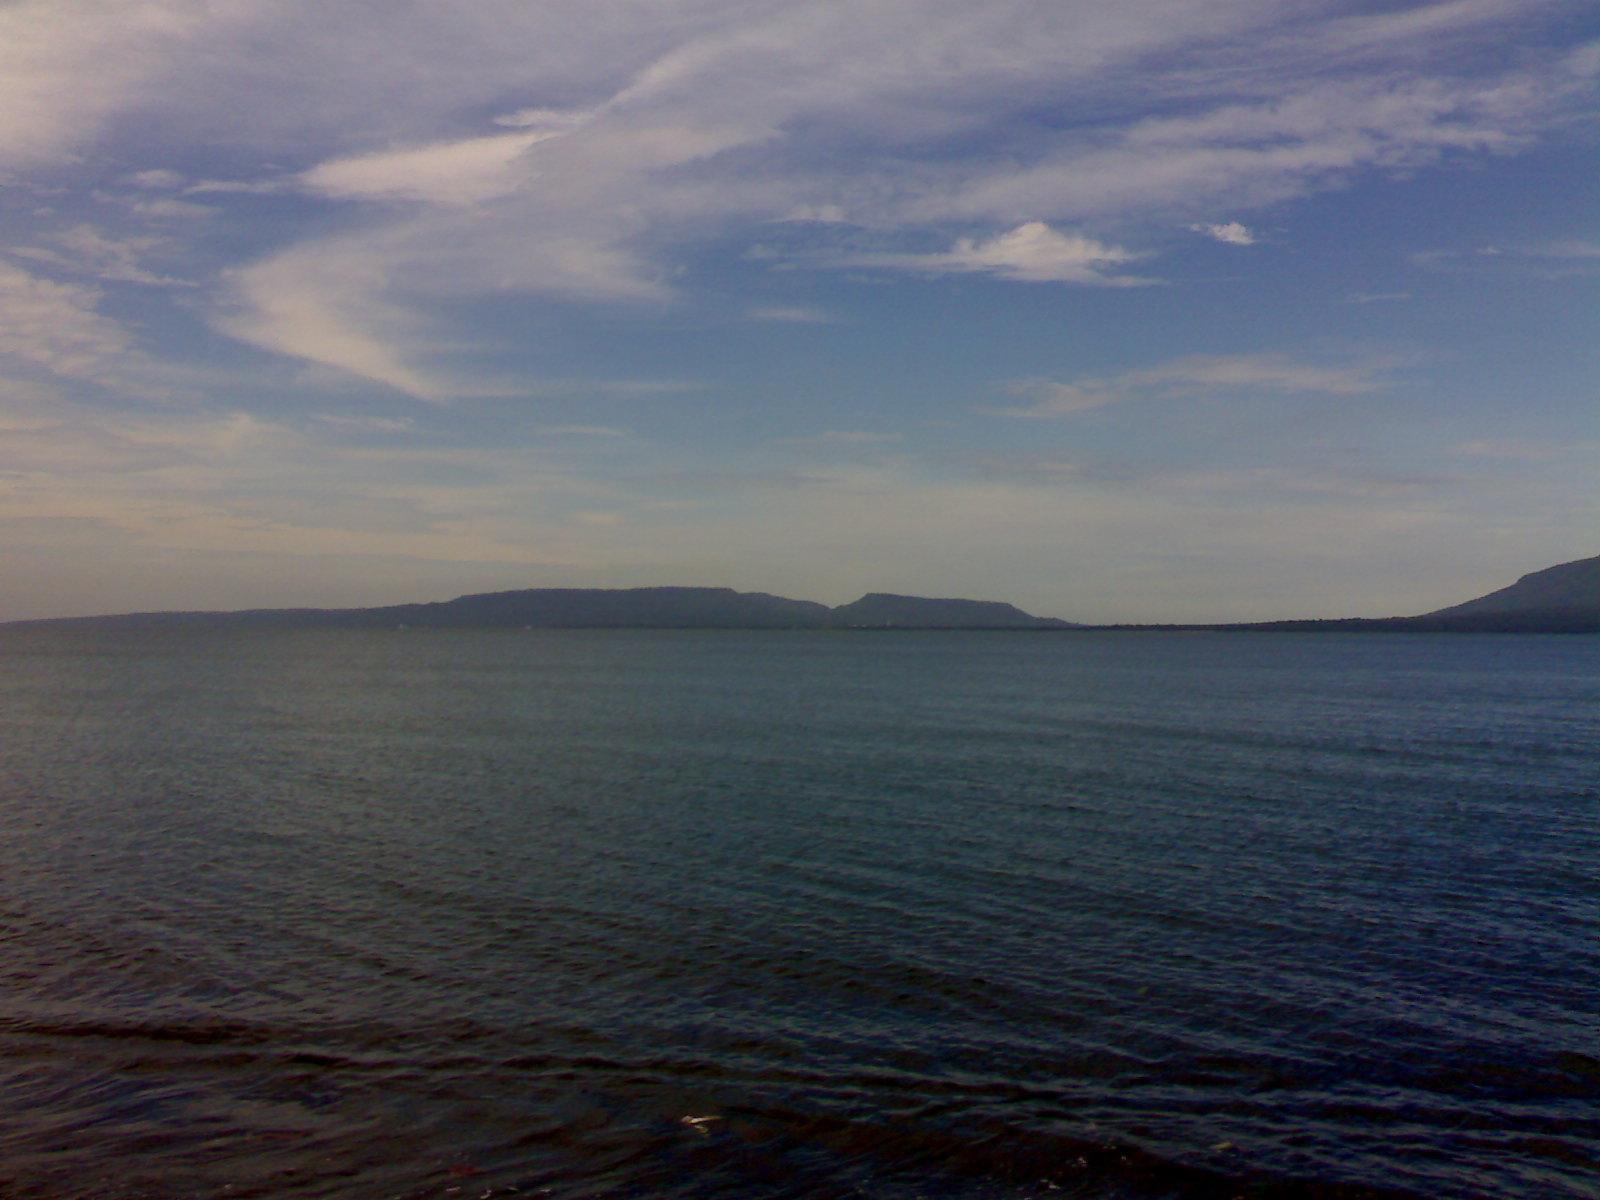 Pulau Santen